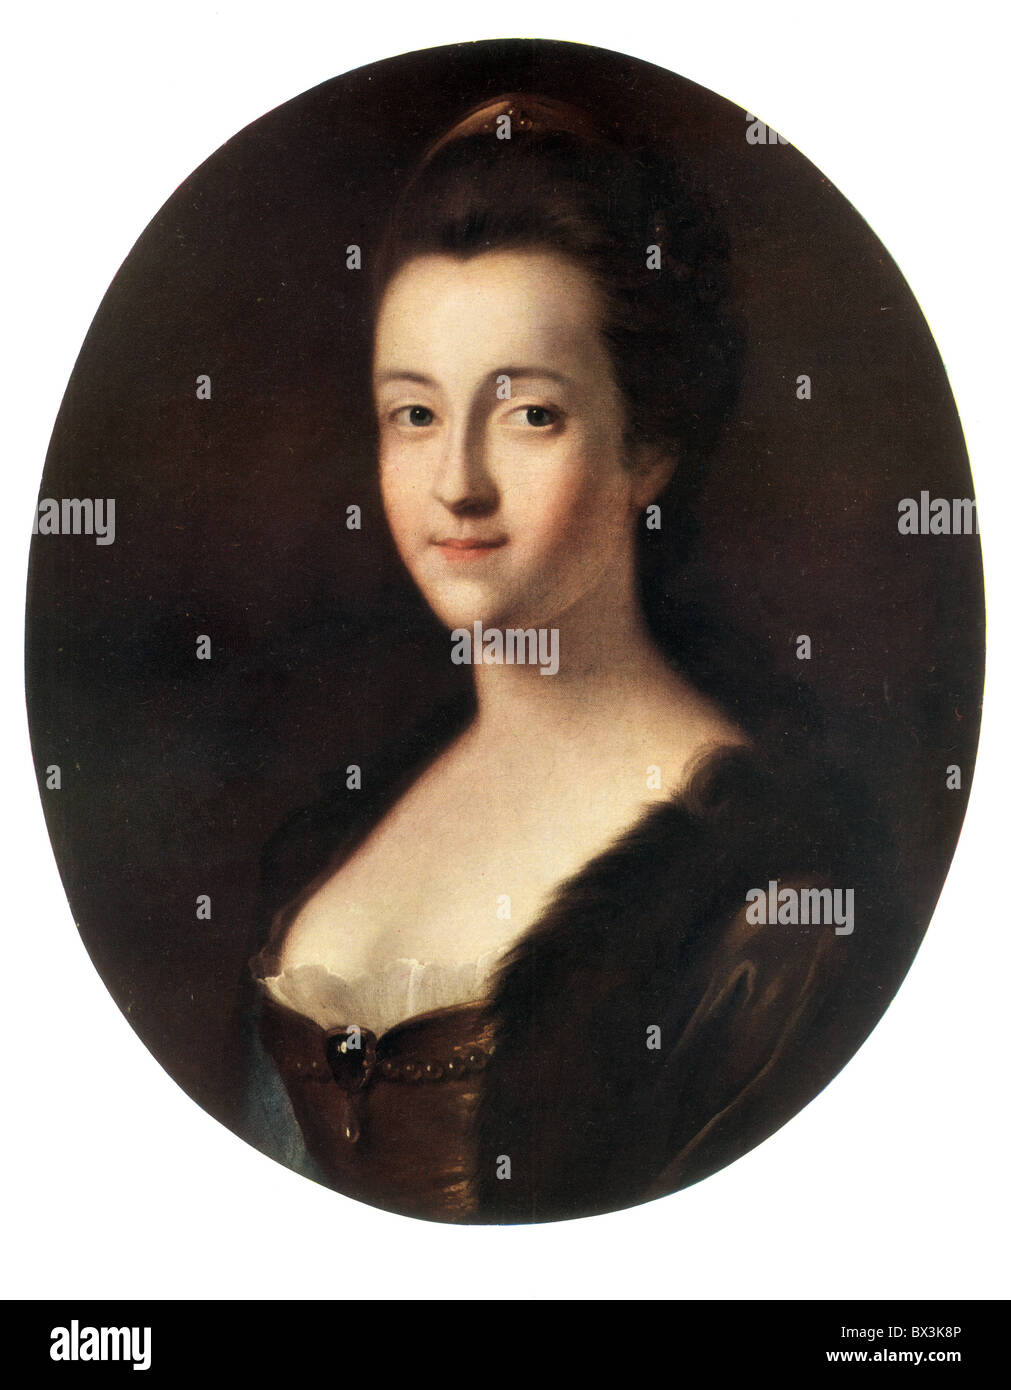 Colour portrait of Elizabeth Craven, Margravine of Brandenburg-Anspach by Thomas Gainsborough - Stock Image